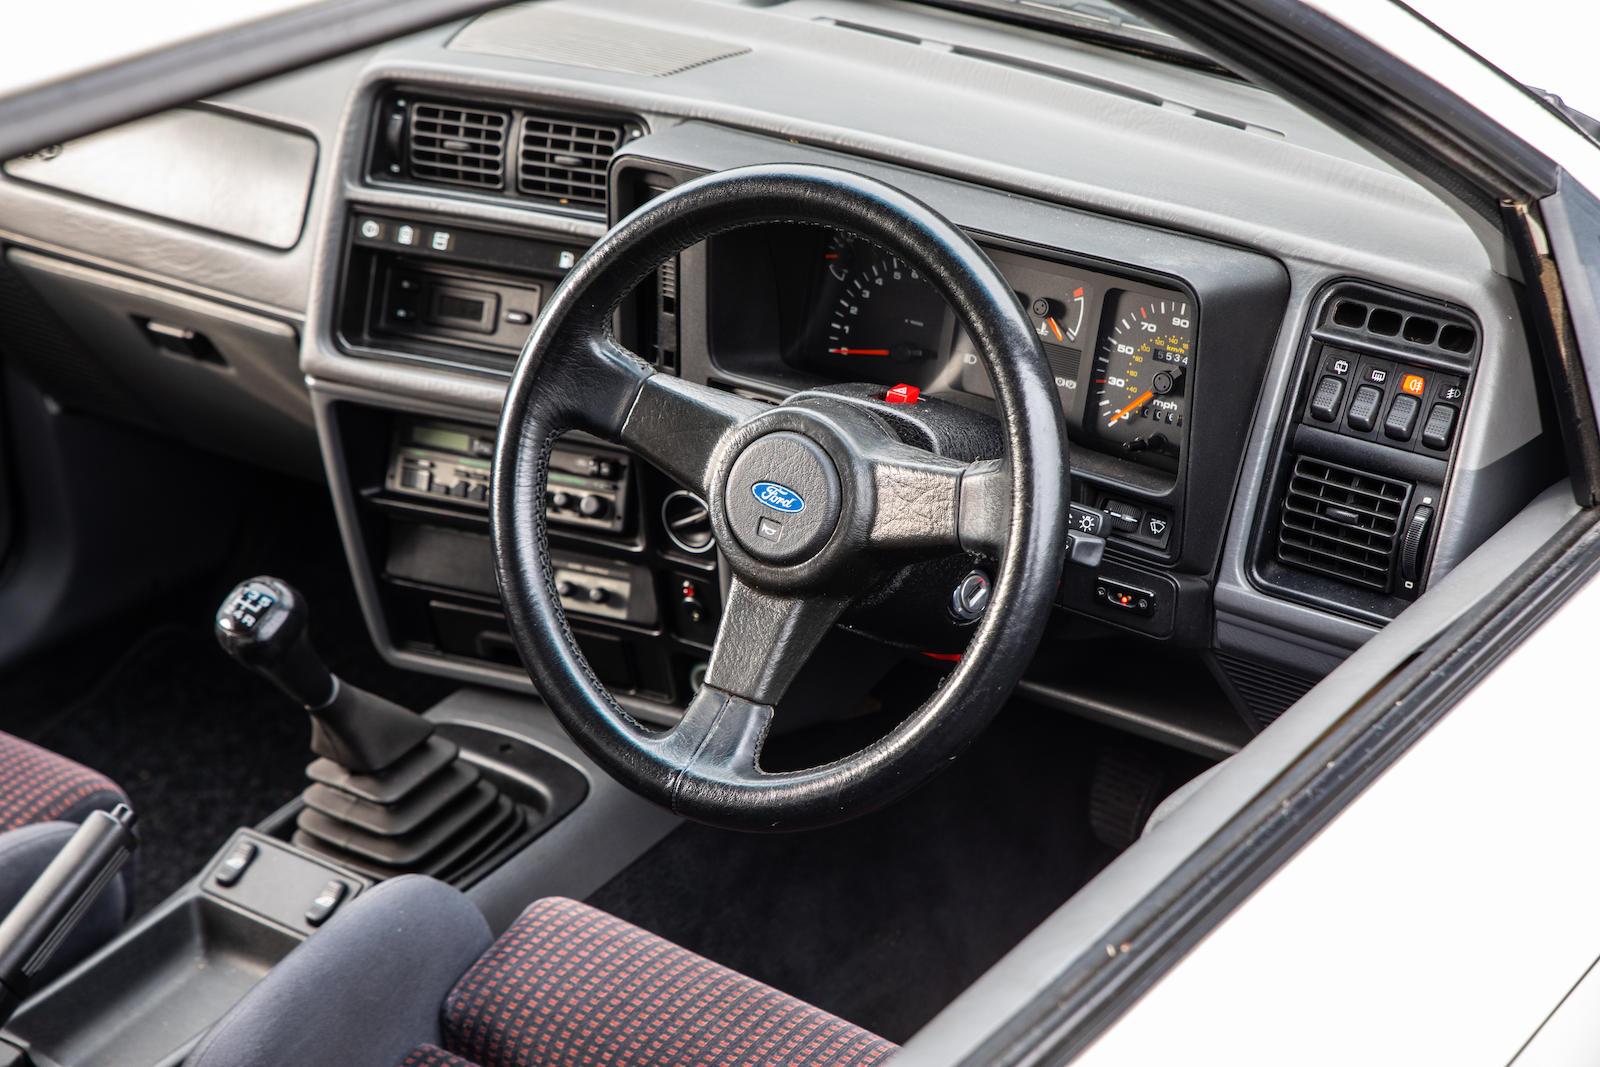 1987 Ford Sierra RS Cosworth Steering Wheel